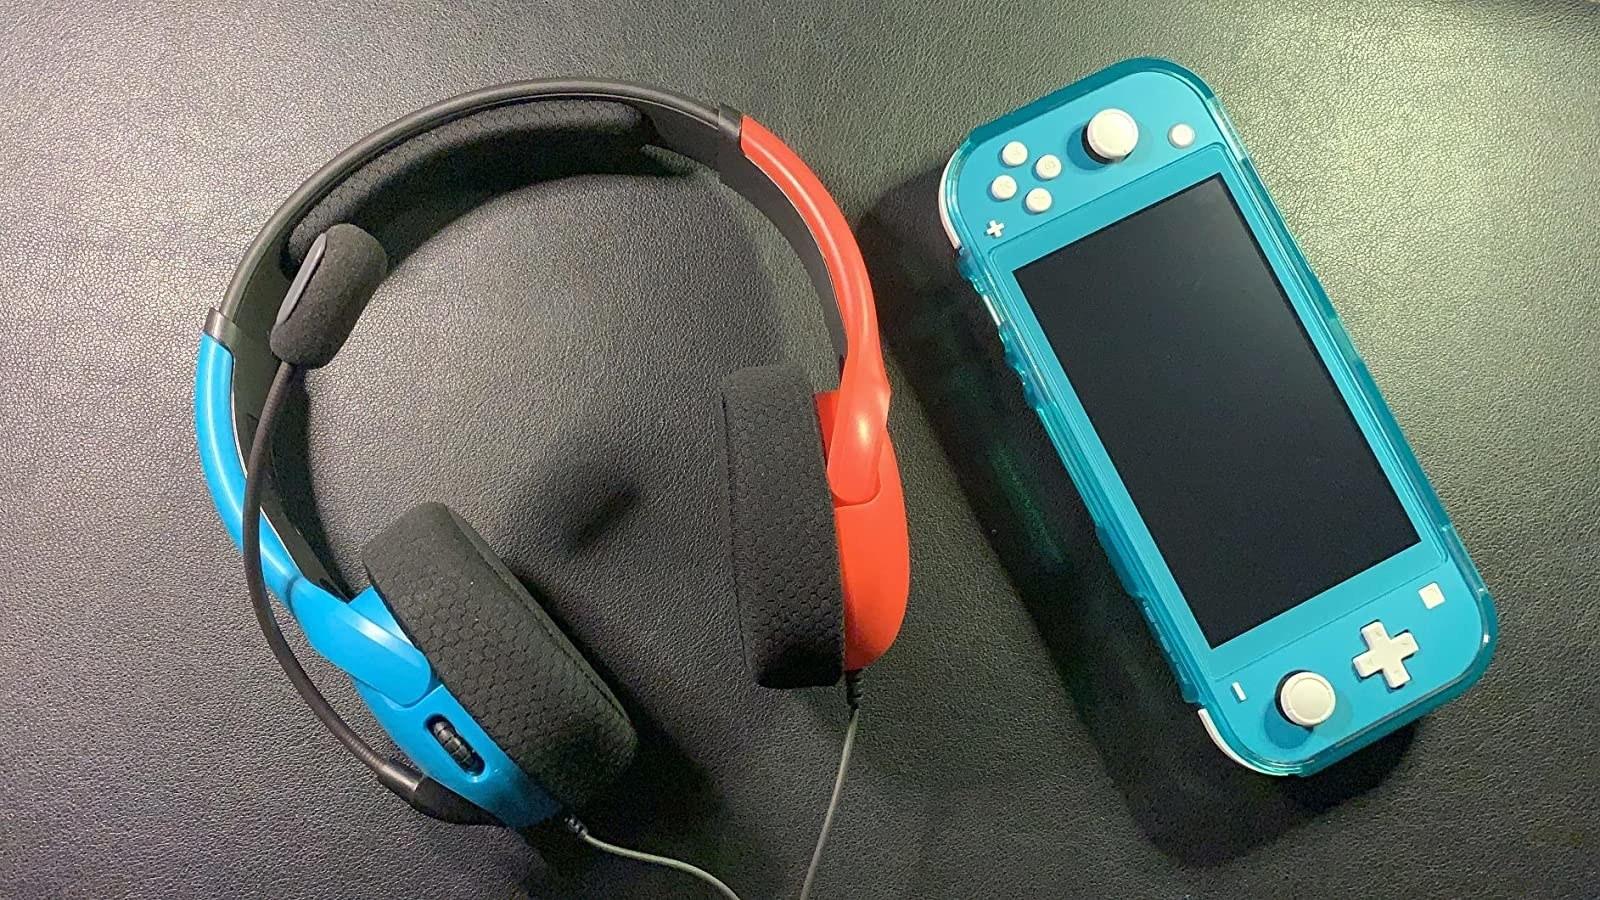 Nintendo Switch headset next to Nintendo Switch Lite.